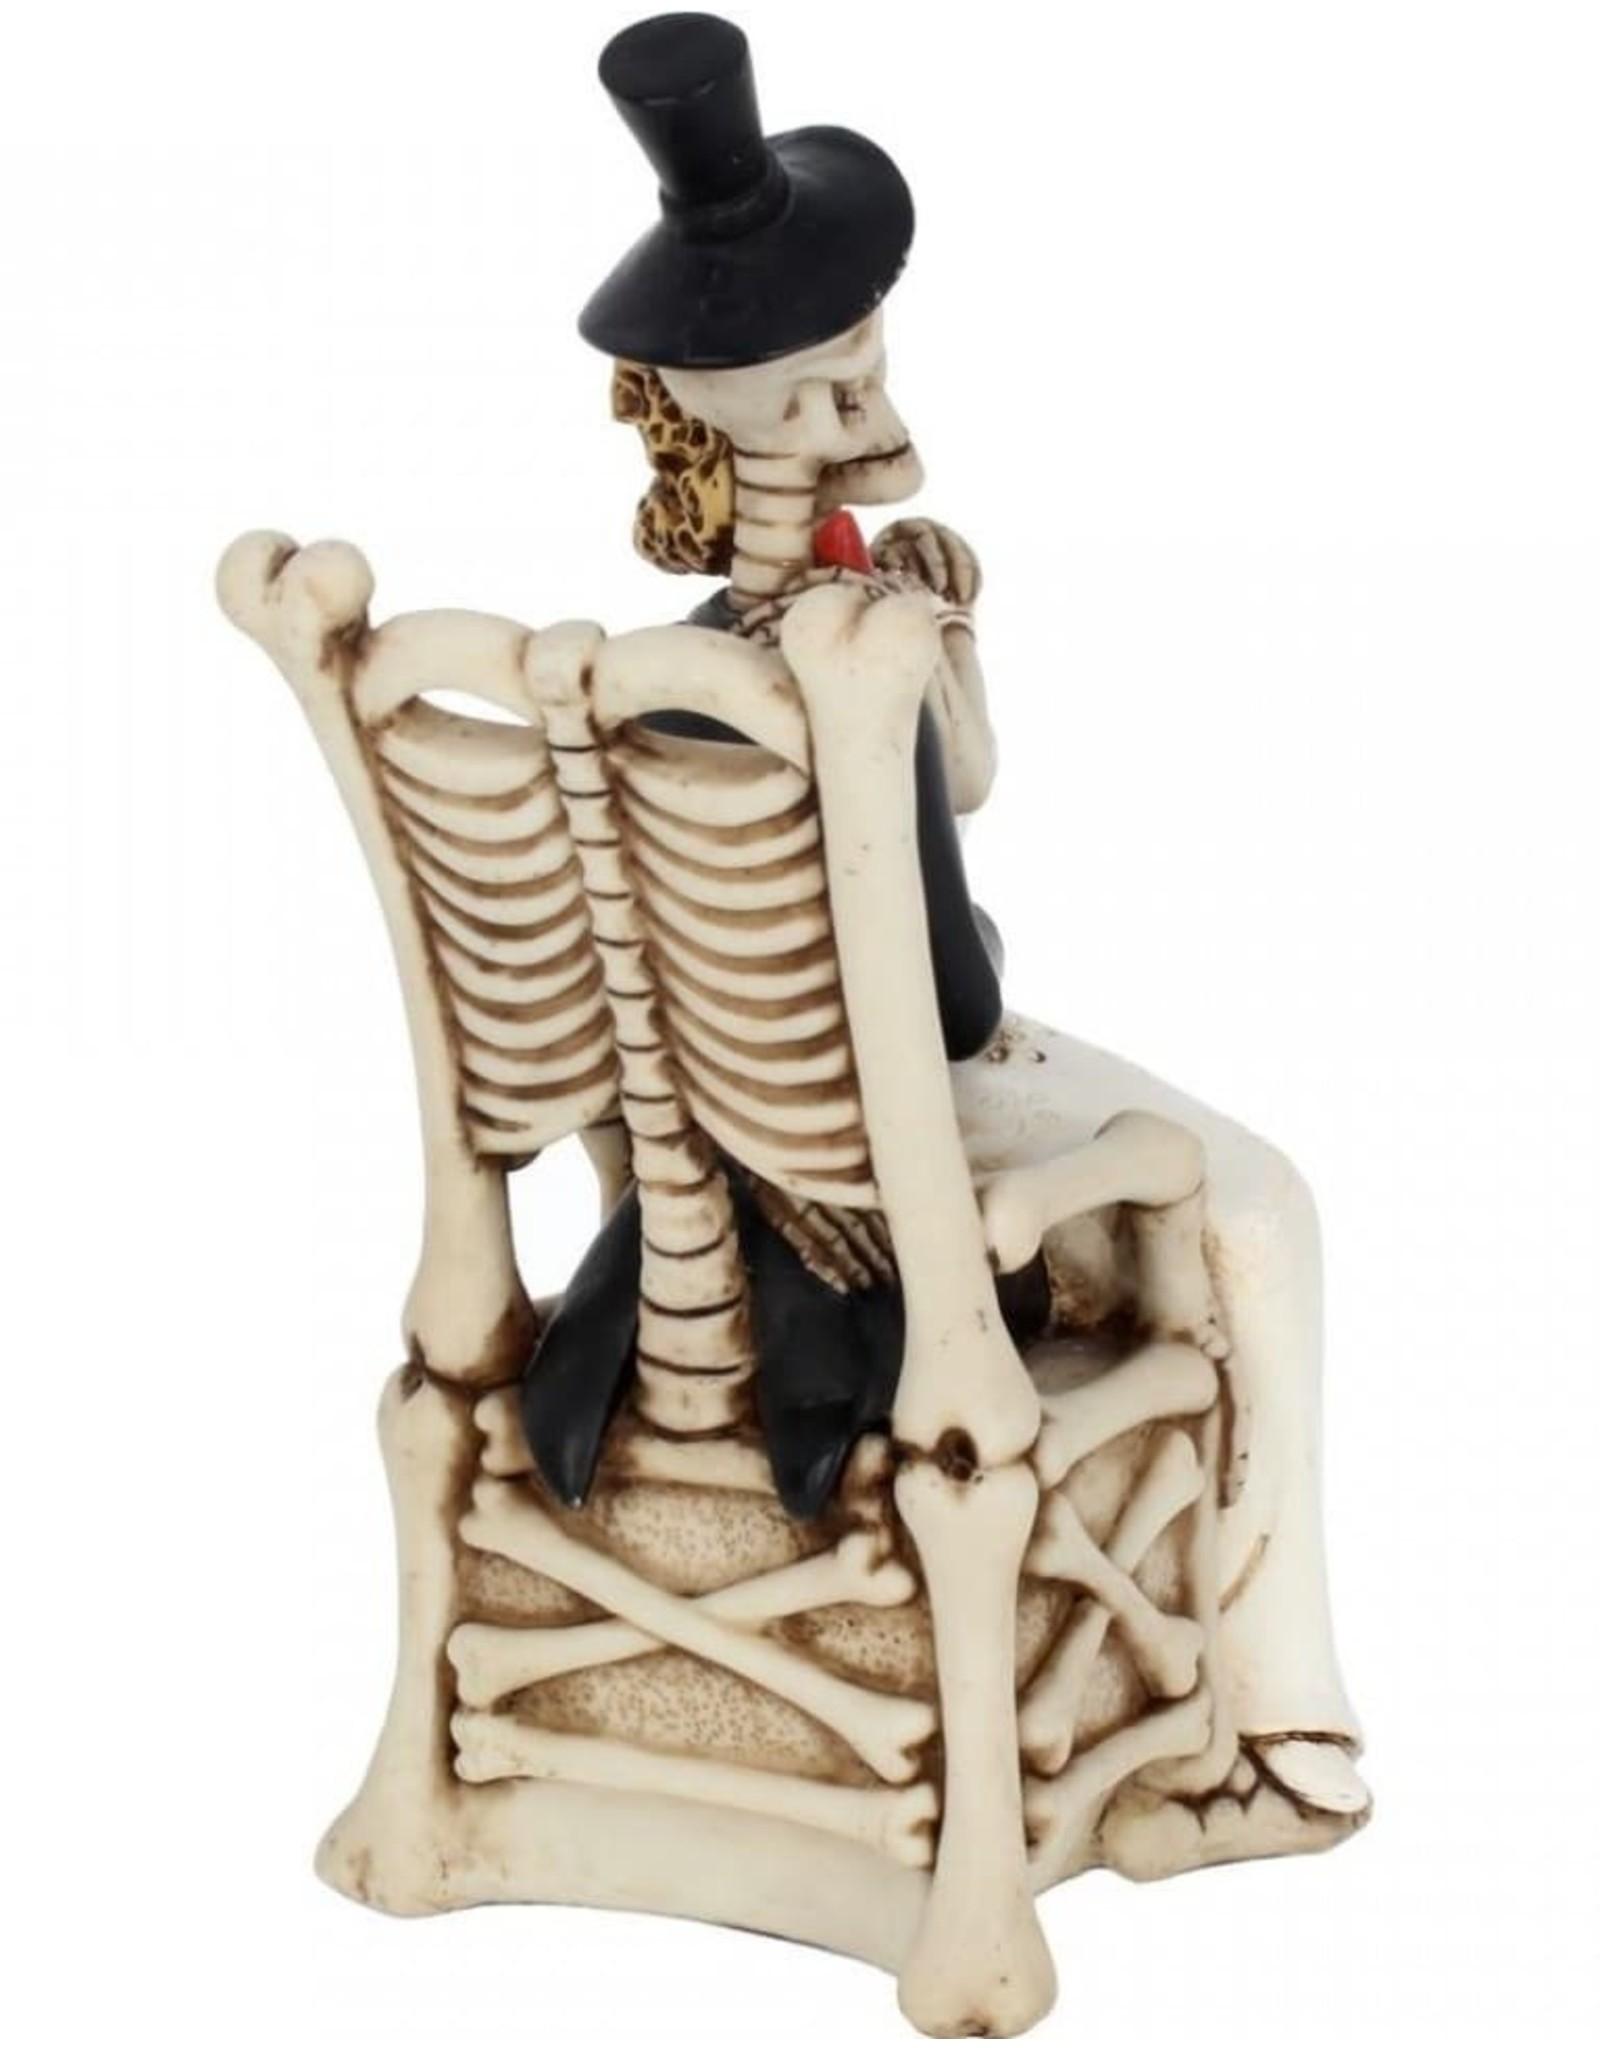 Alator Collectables - Skeletten Bruidspaar For Better, For Worse - Nemesis Now